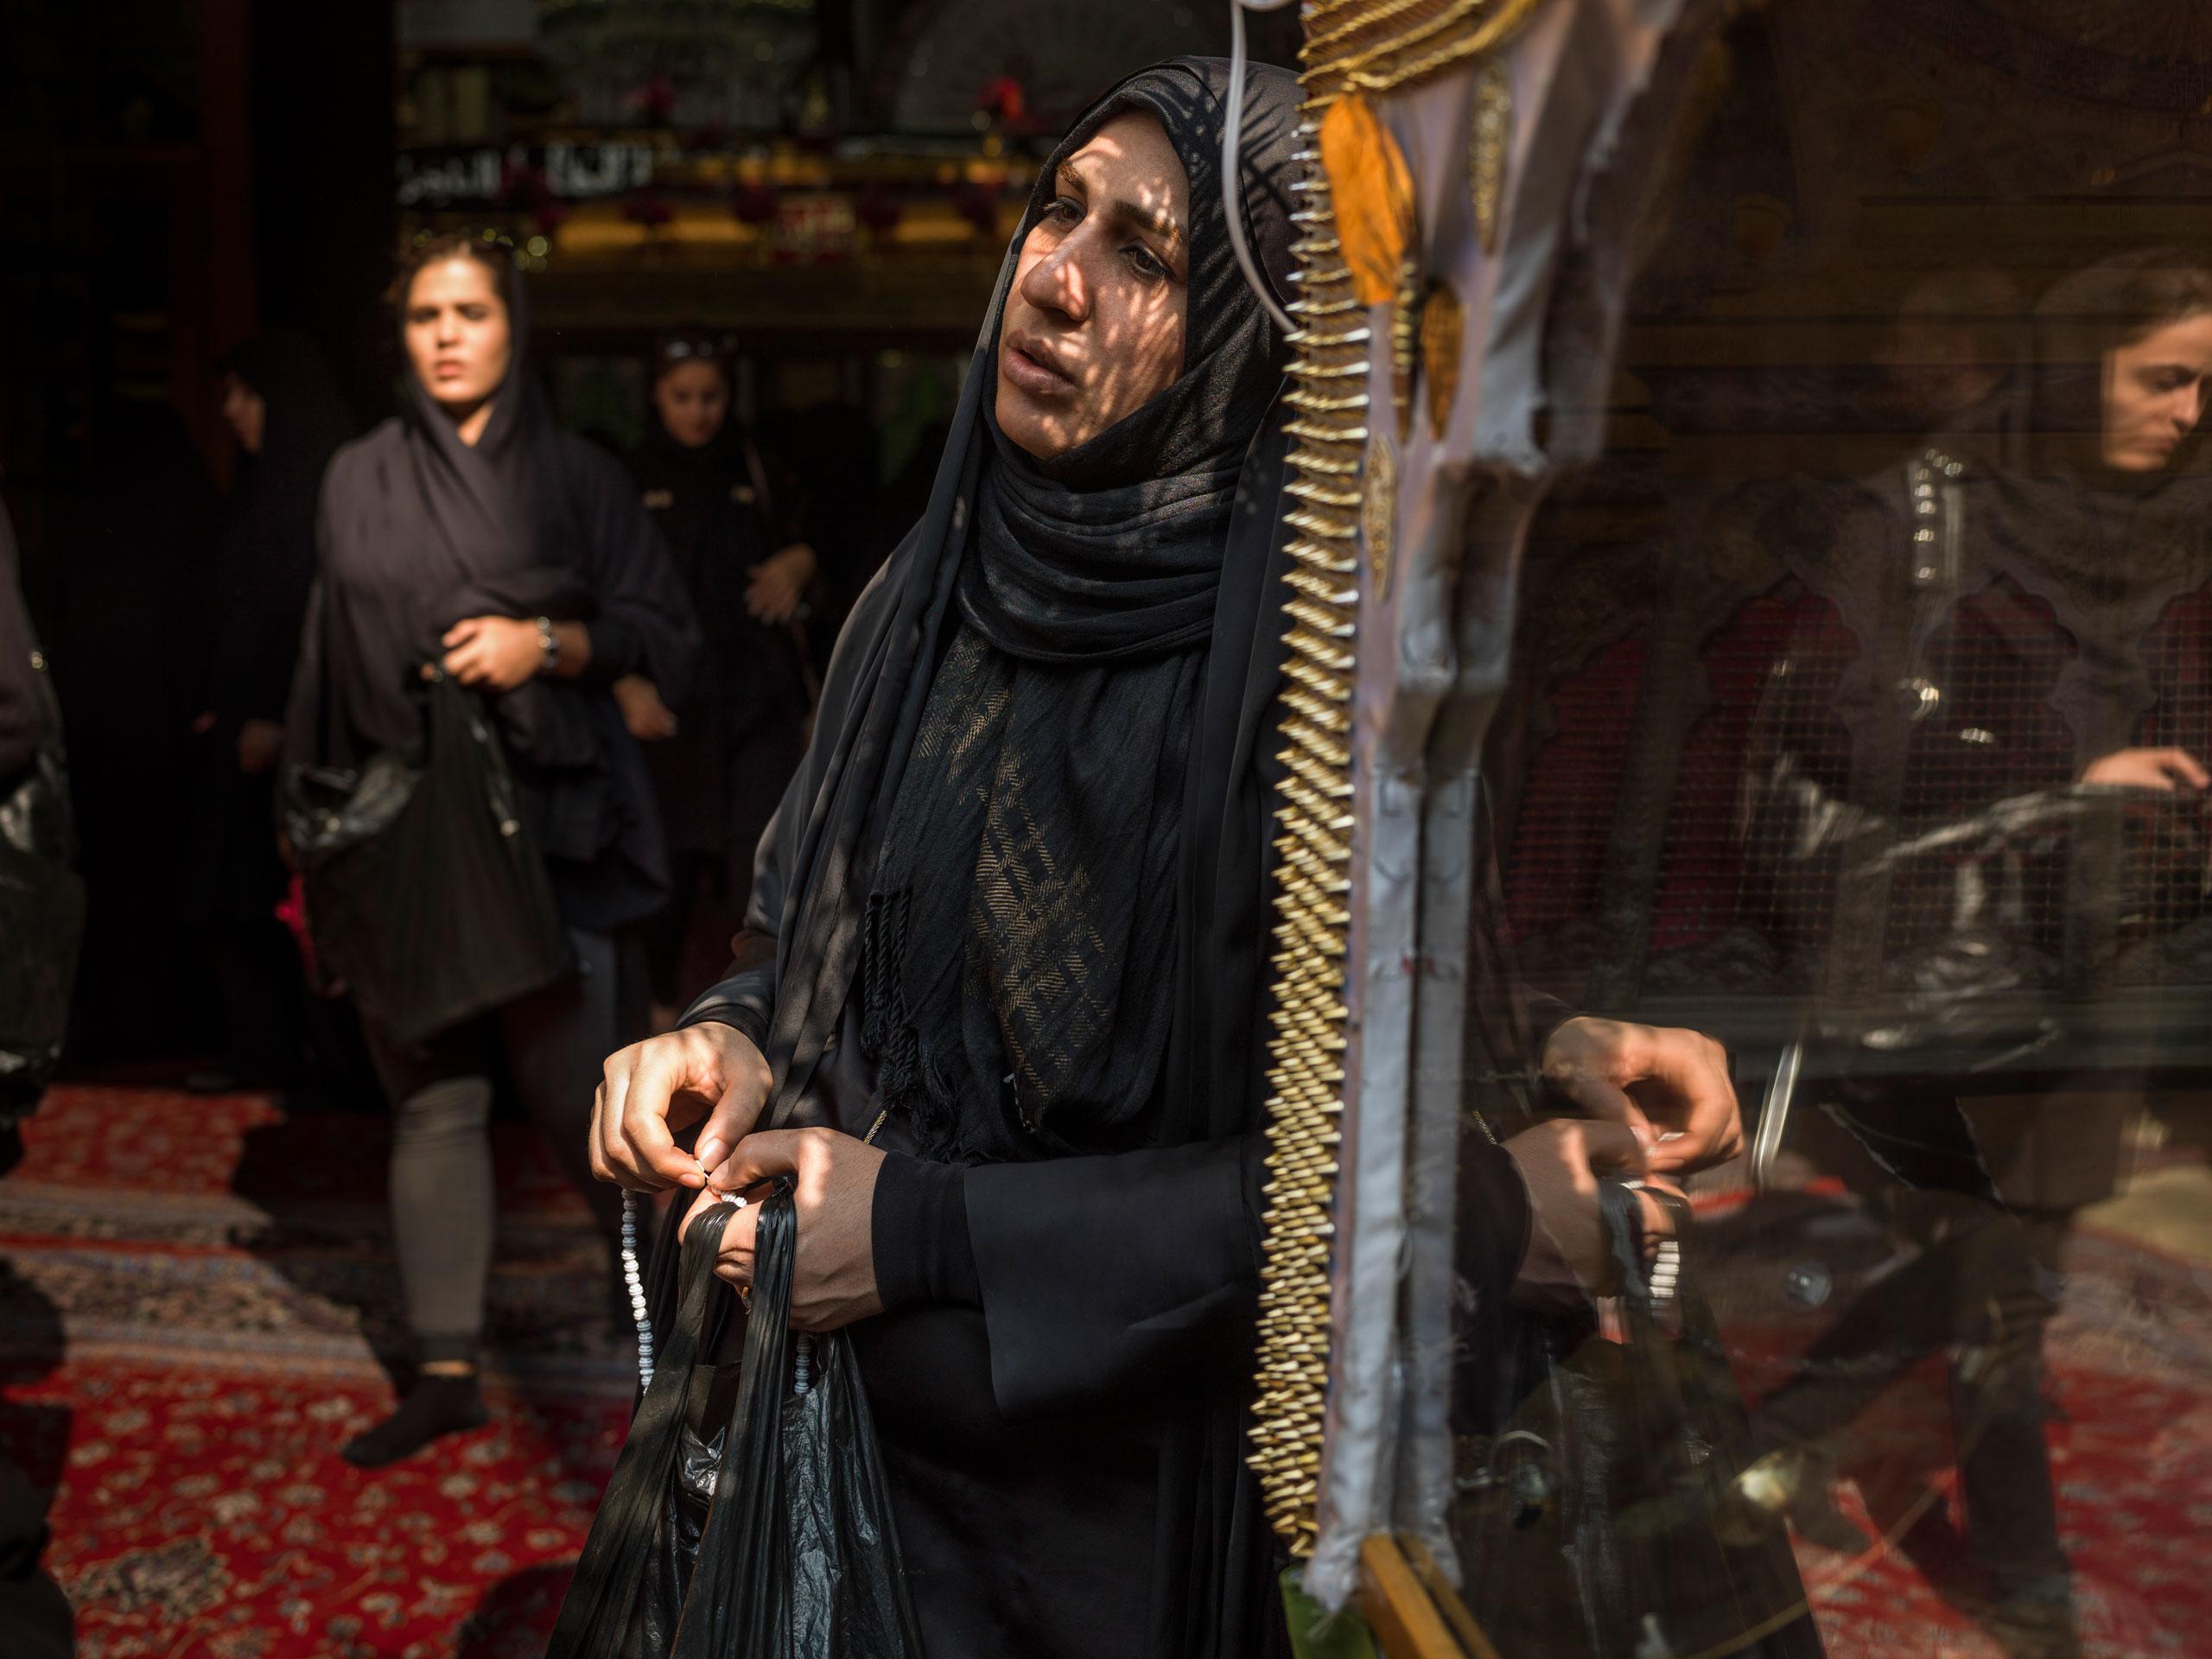 Iranian women listen to a religious speech in a mosque.